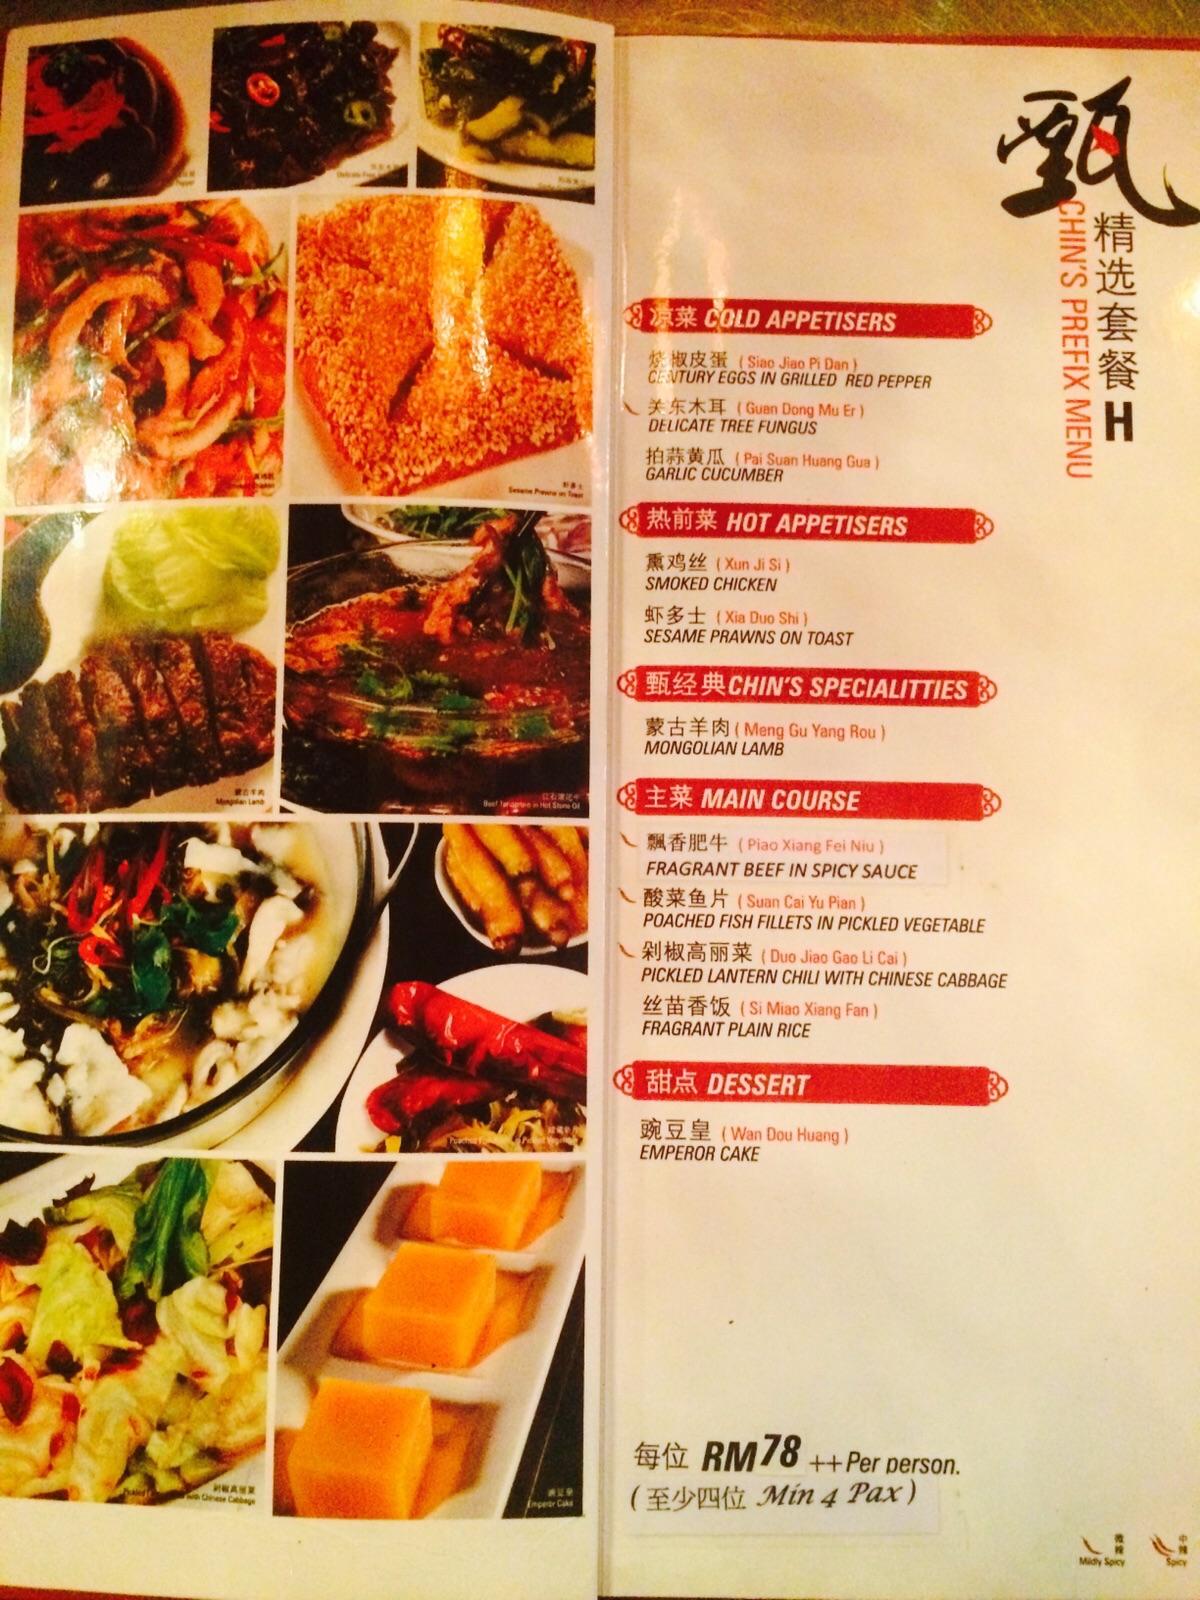 Stylish chins chinese cuisine price 2019